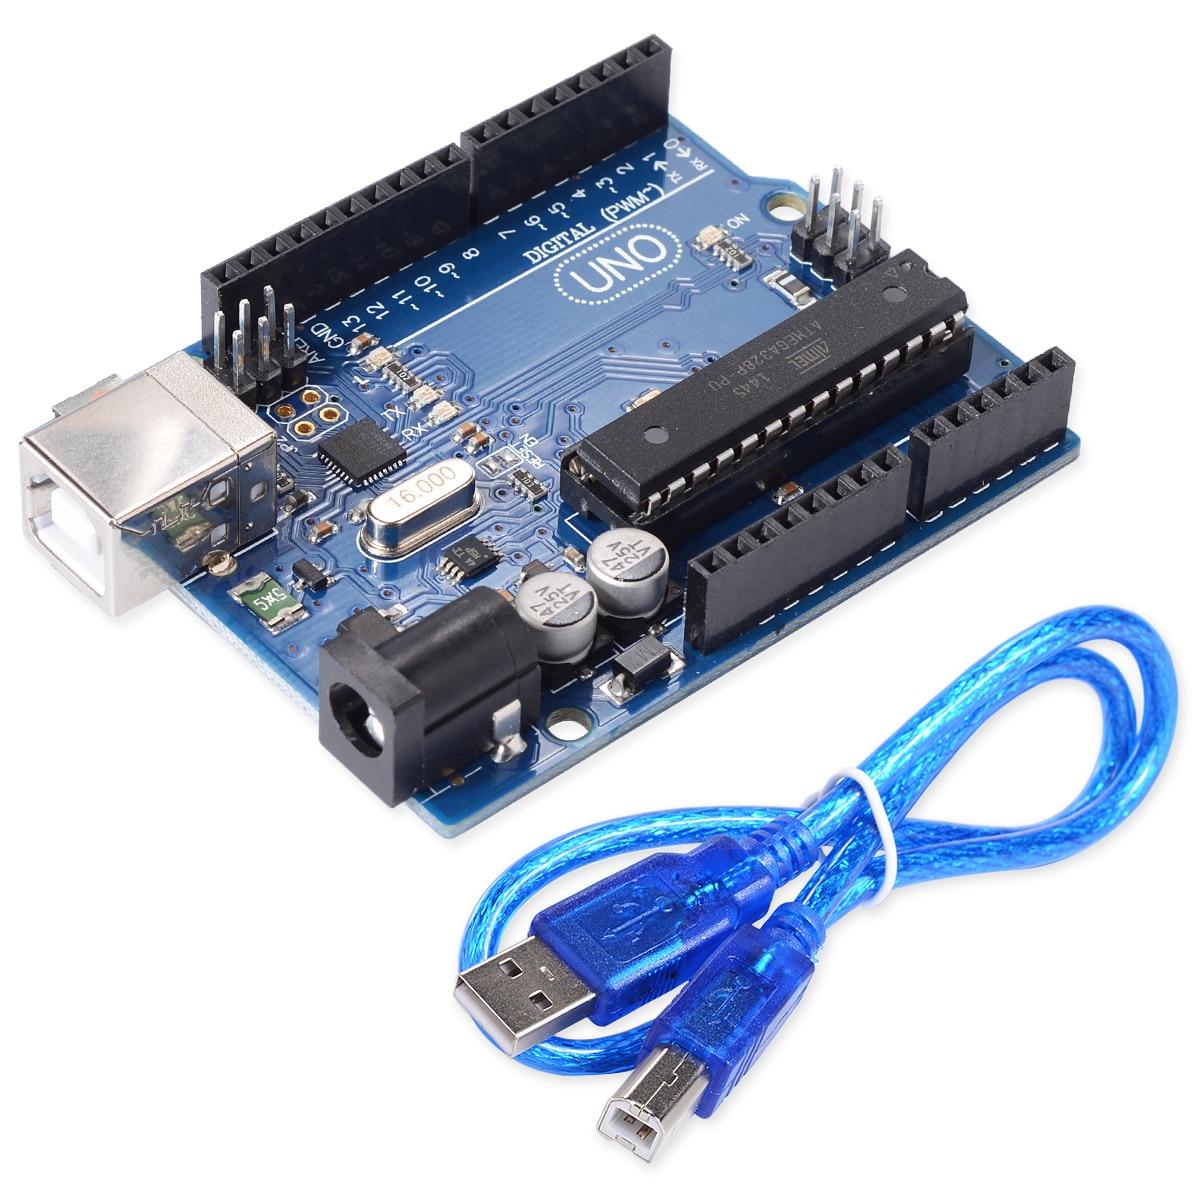 10 ensembles UNO R3 pour Arduino (sans LOGO) MEGA328P ATMEGA16U2 10 set = 10 pcs conseil + 10 pcs usb câble